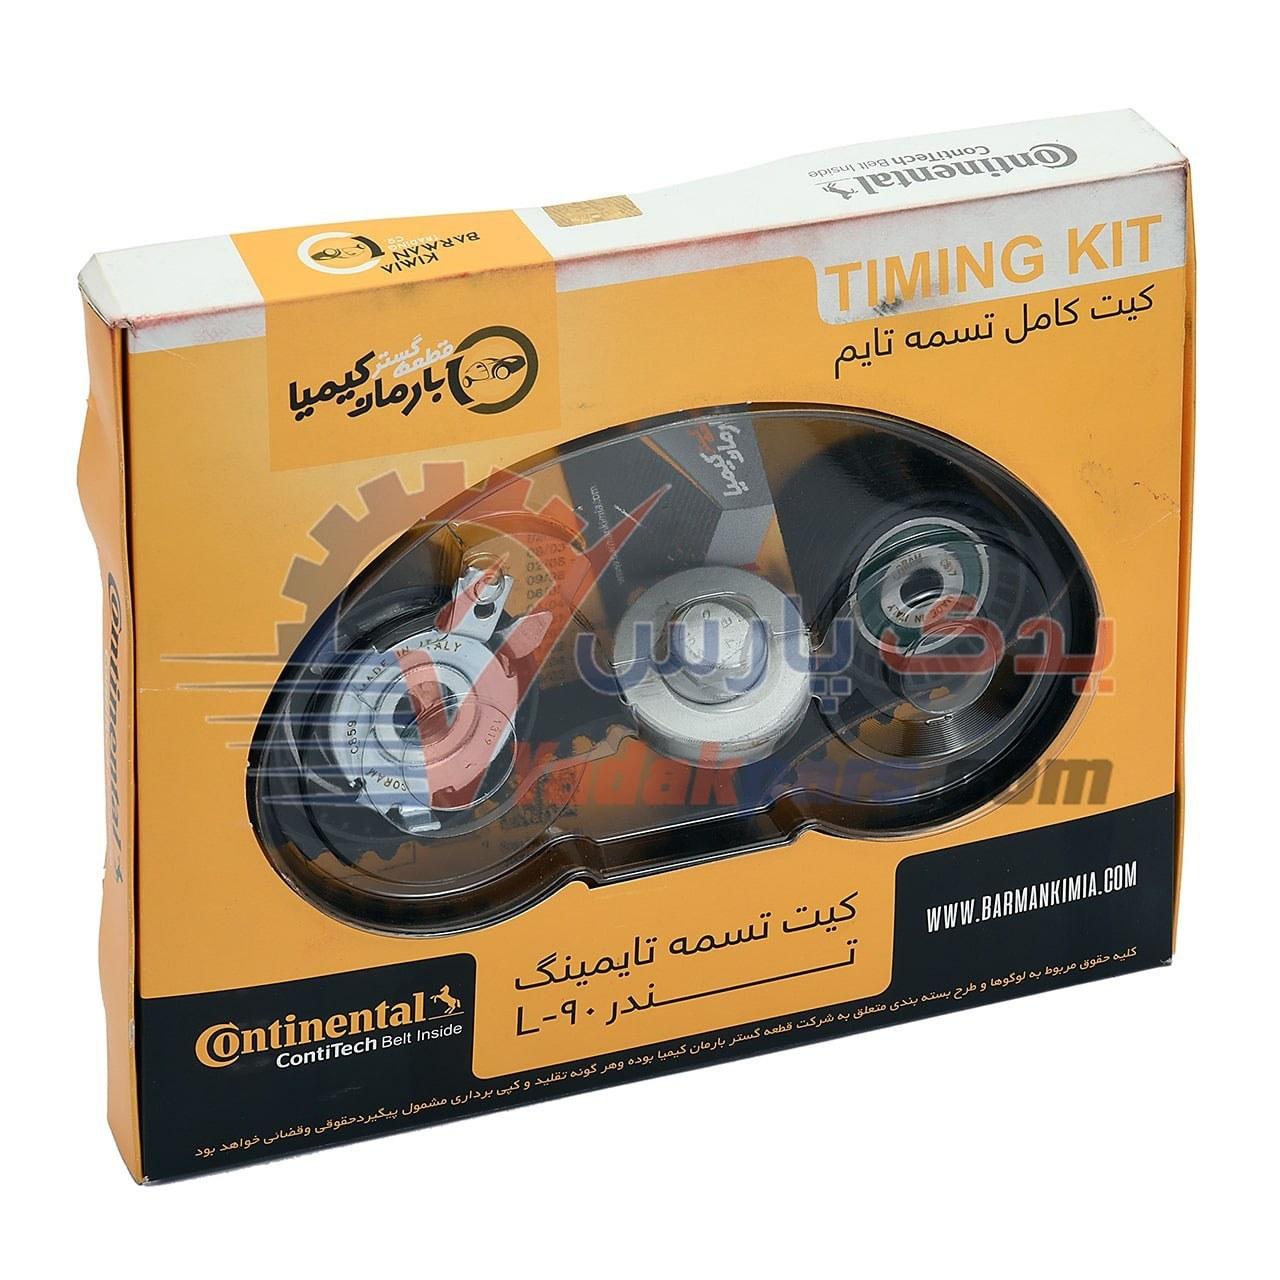 تصویر کیت کامل تسمه تایم ال90/ساندرو برند کنتیننتال (اصلی) Continental Timing Belt Kit CT 1126 132Z Tondar90 & L90 Engineered in GERMANY